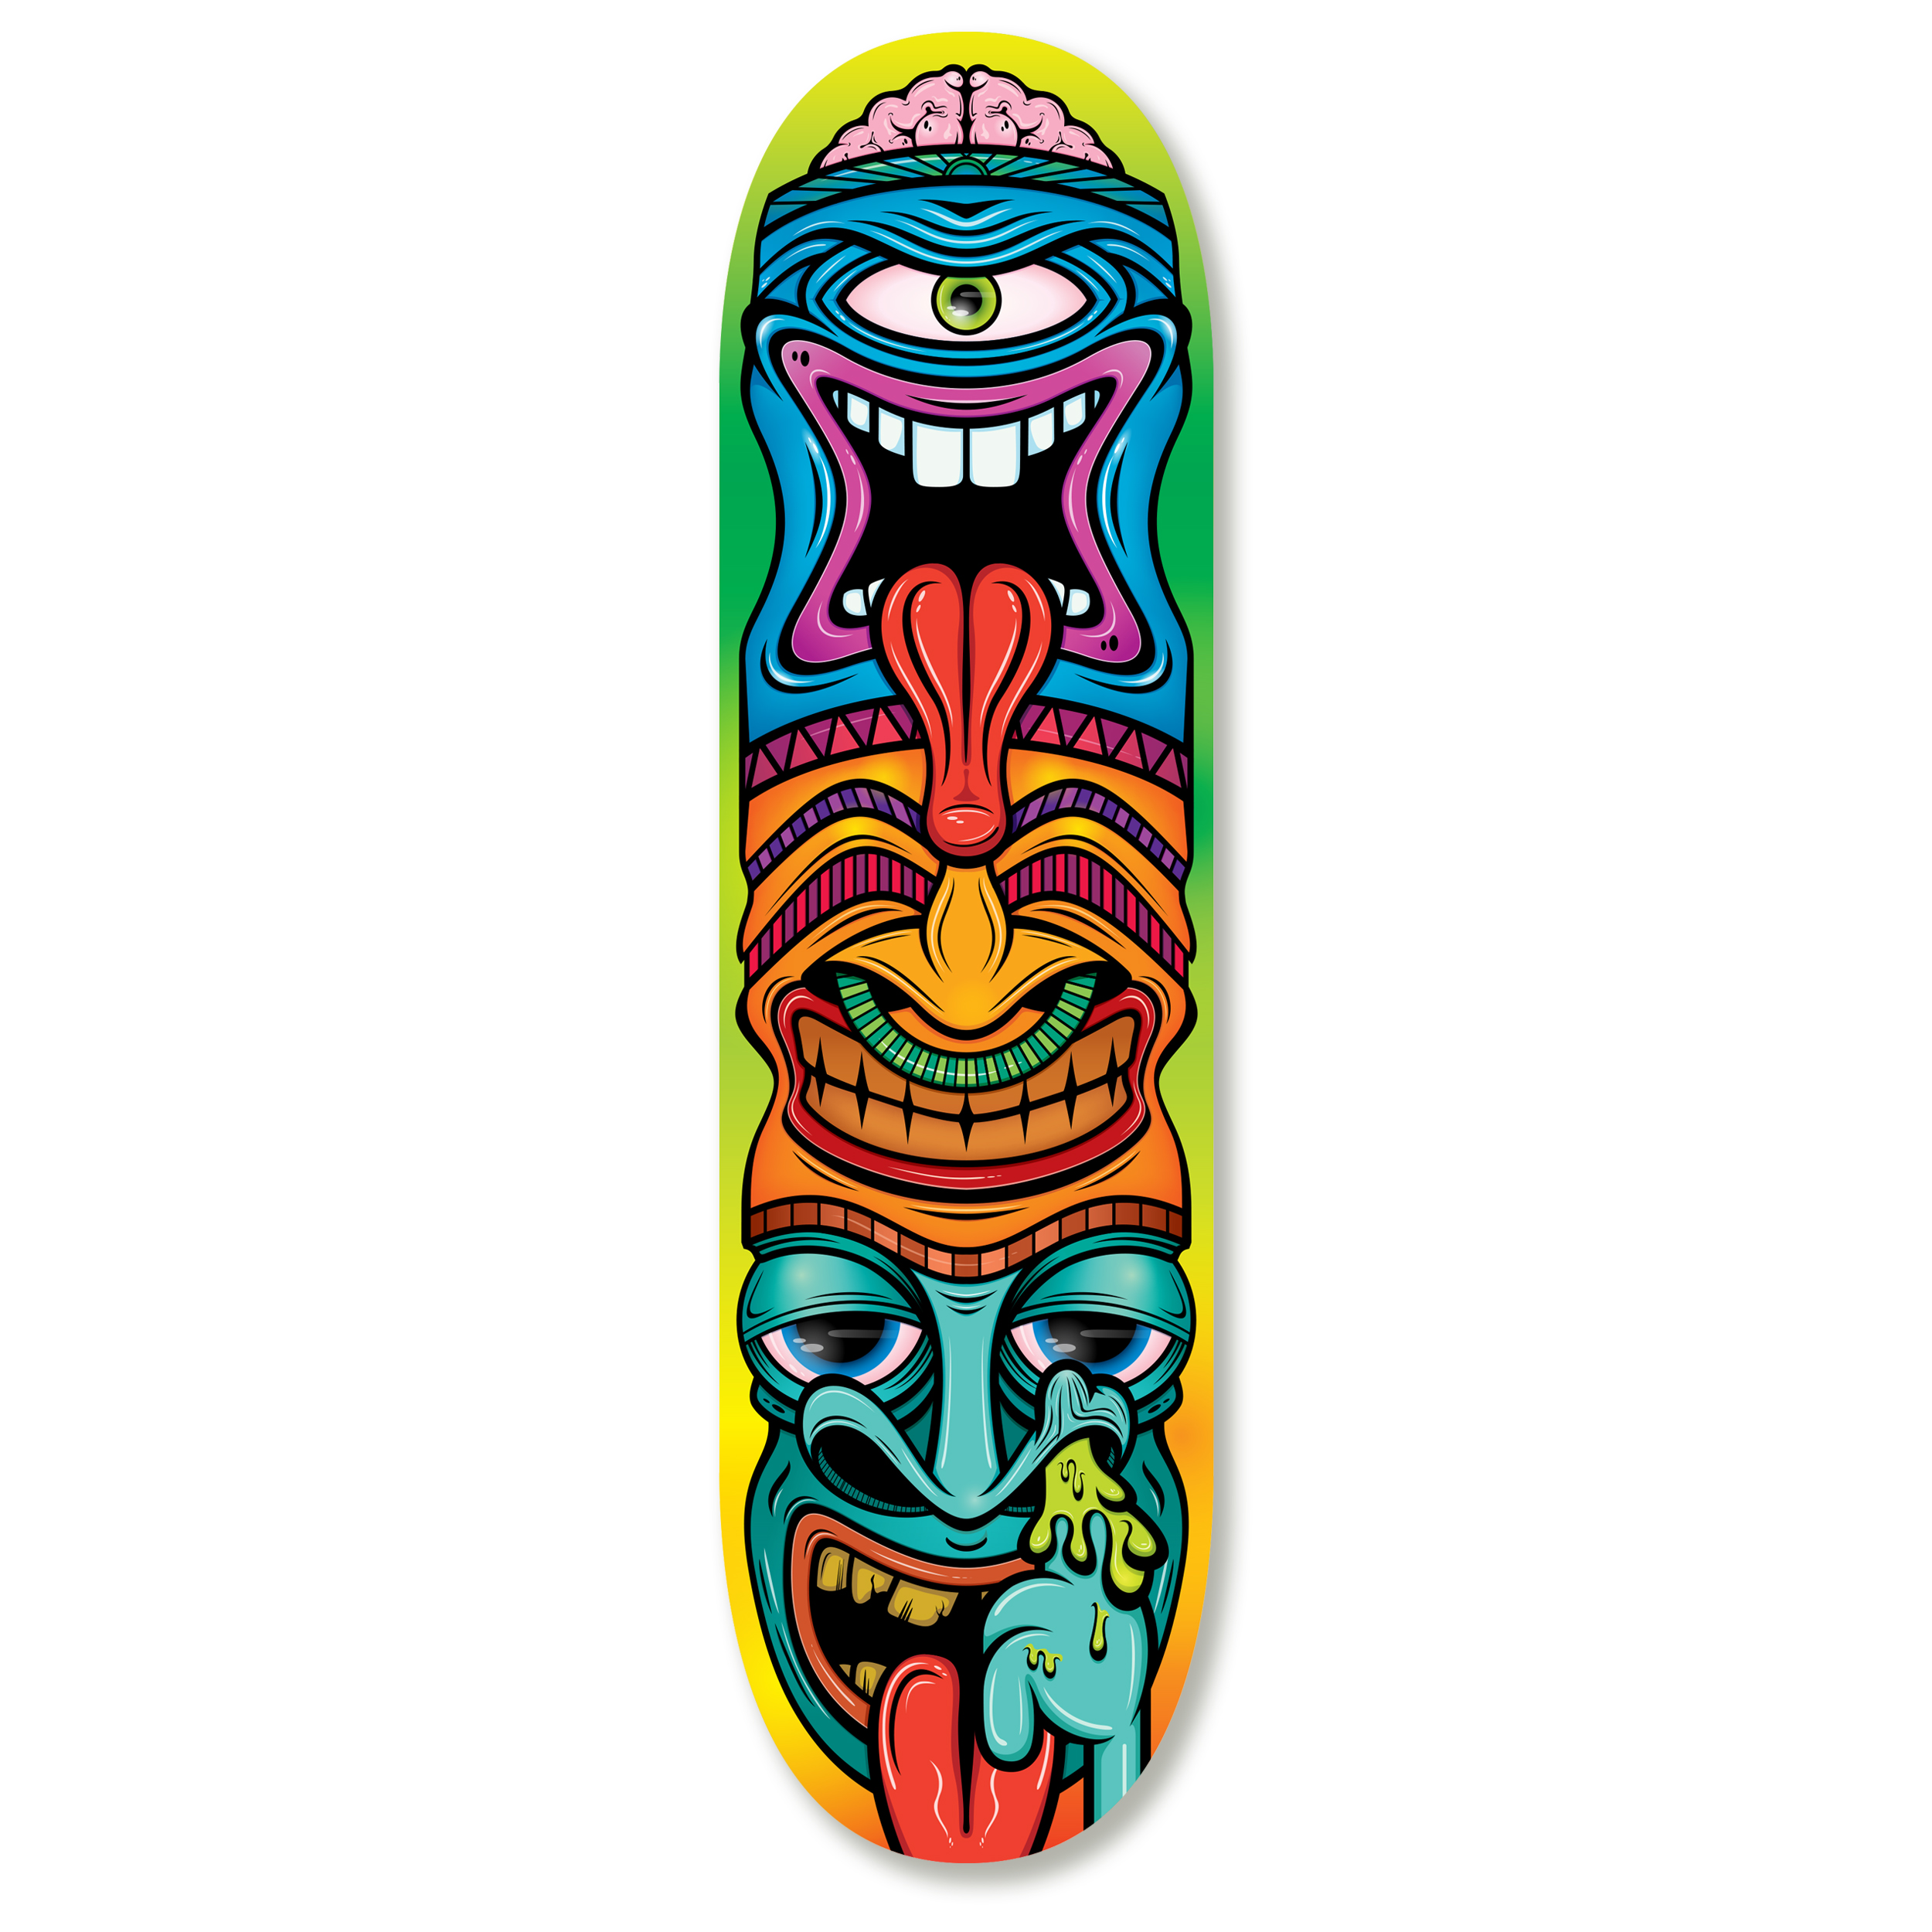 skateboard-deck-hawaiian-tiki-02.jpg